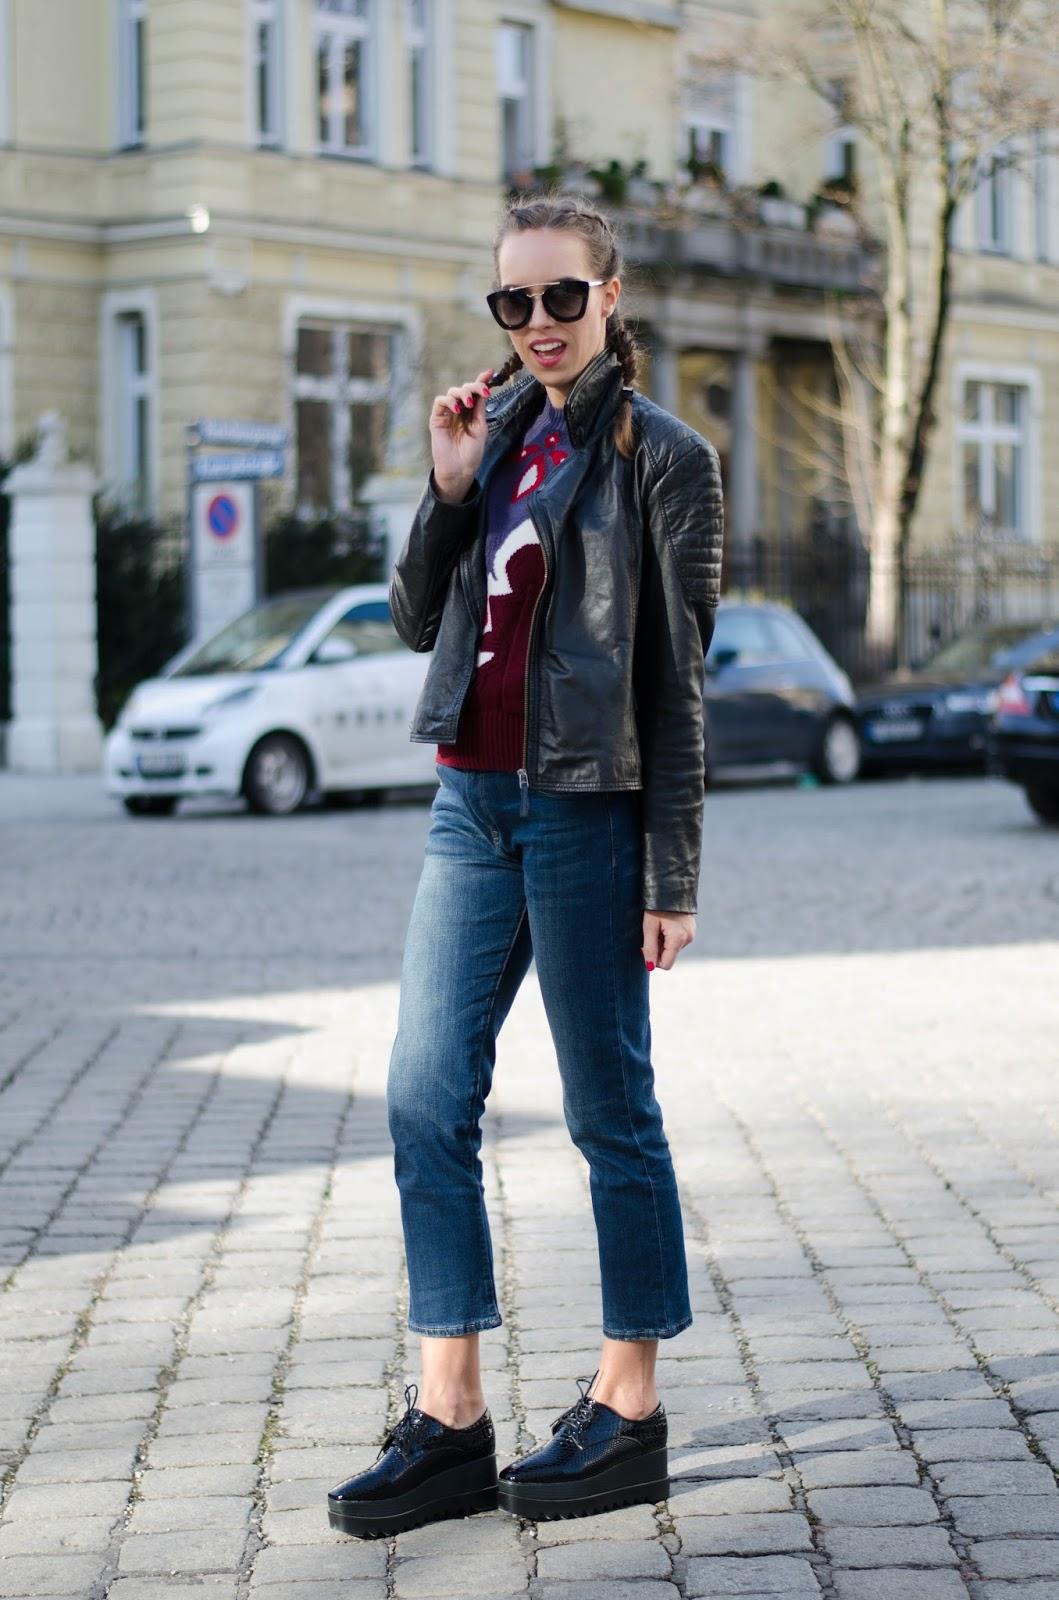 kristjaana mere prada sunglasses barneys leather jacket dutch braids spring outfit